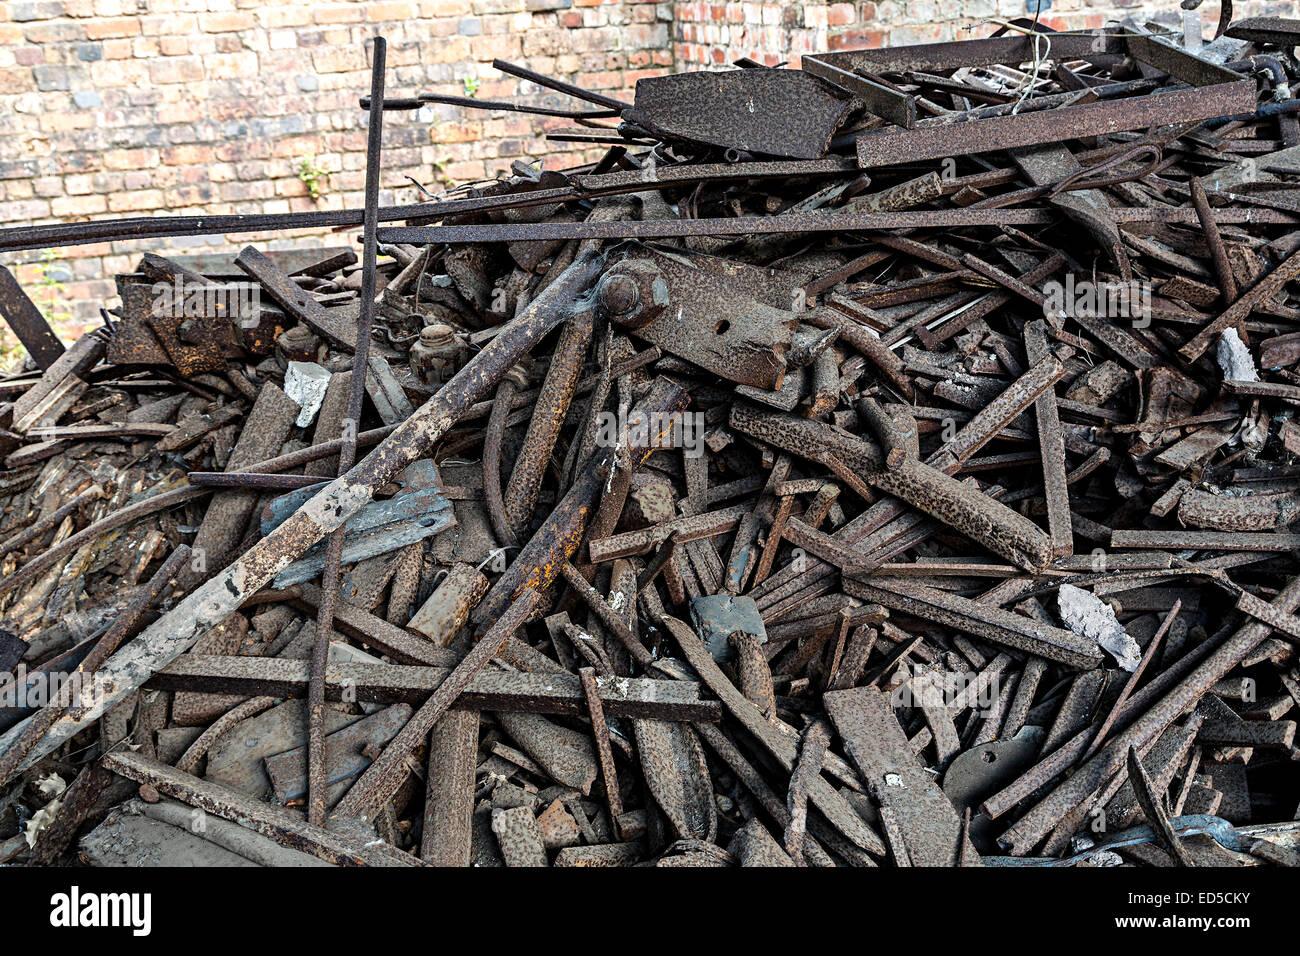 Heap of rusting scrap metal, England, UK - Stock Image